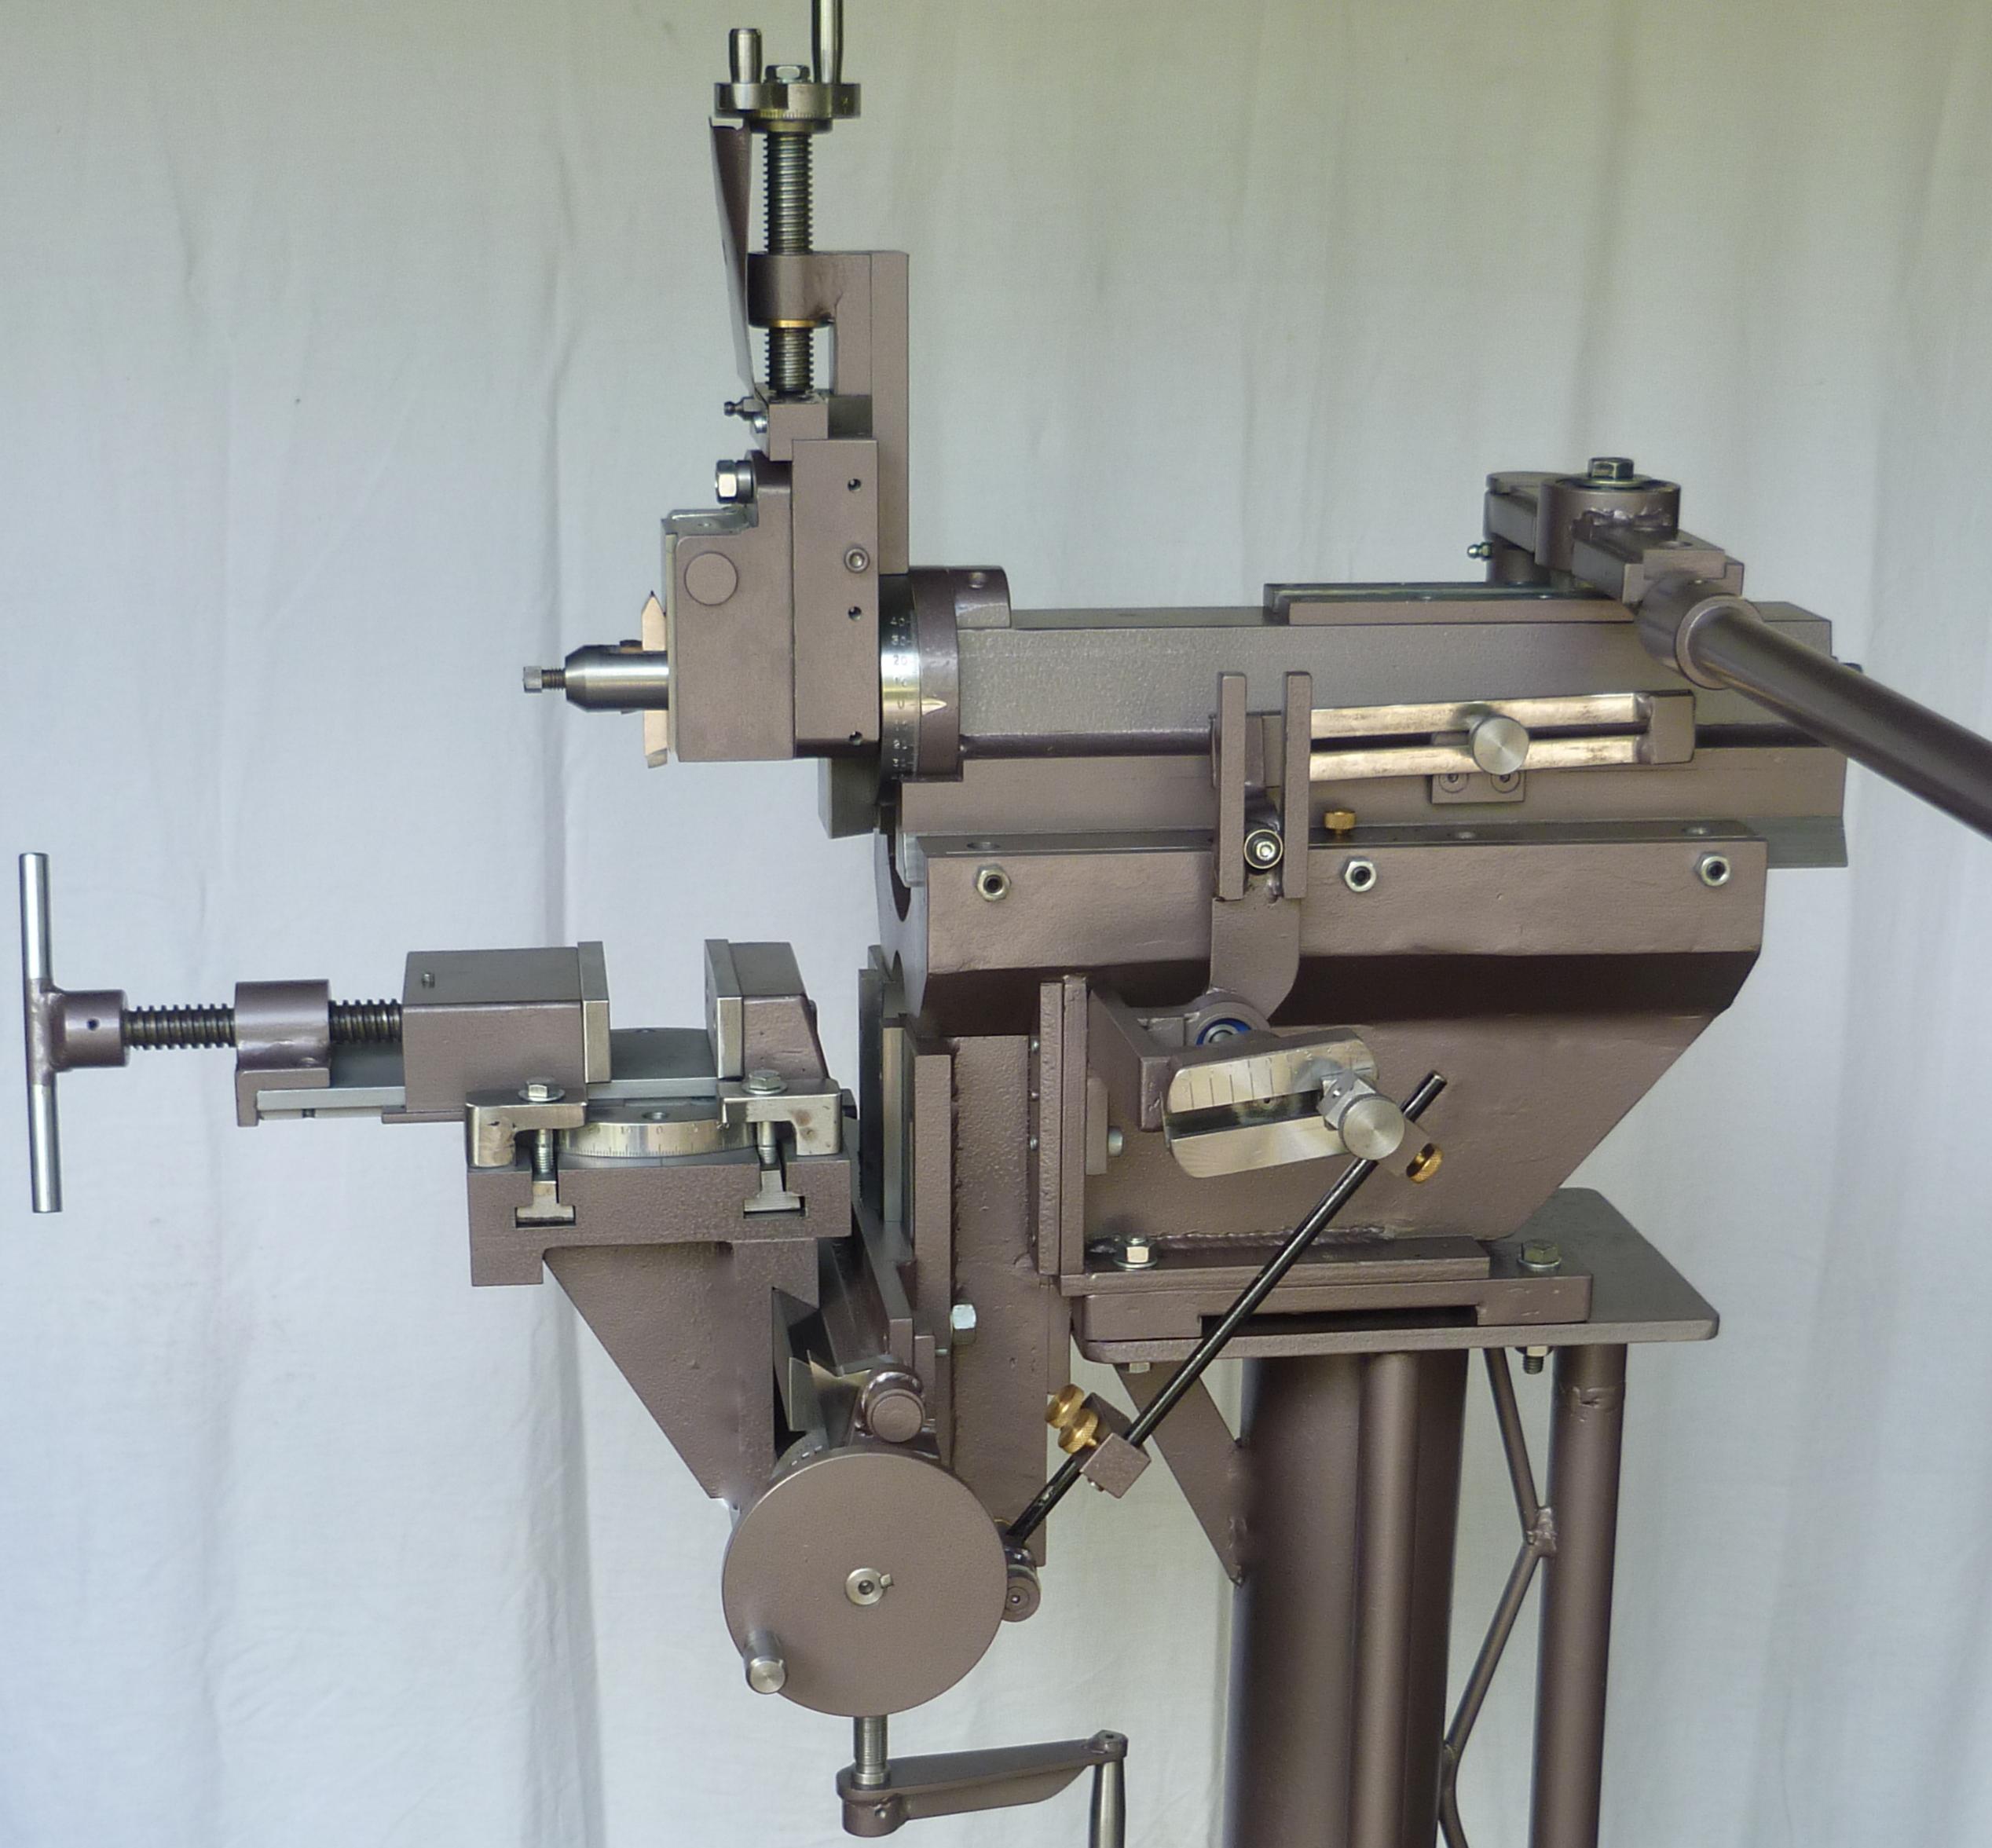 Acto 6 Hand Metal Shaper Plans Machineryplans